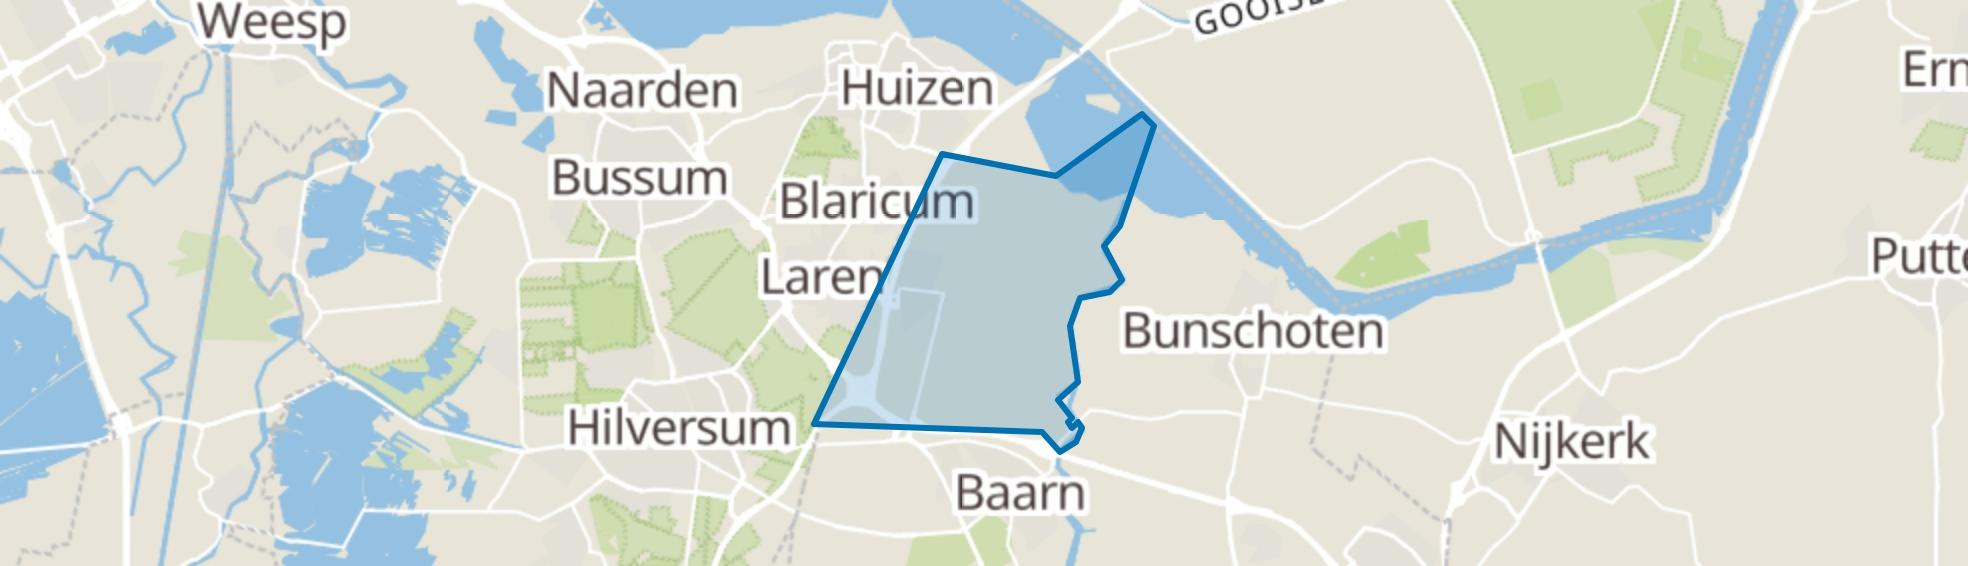 Eemnes map